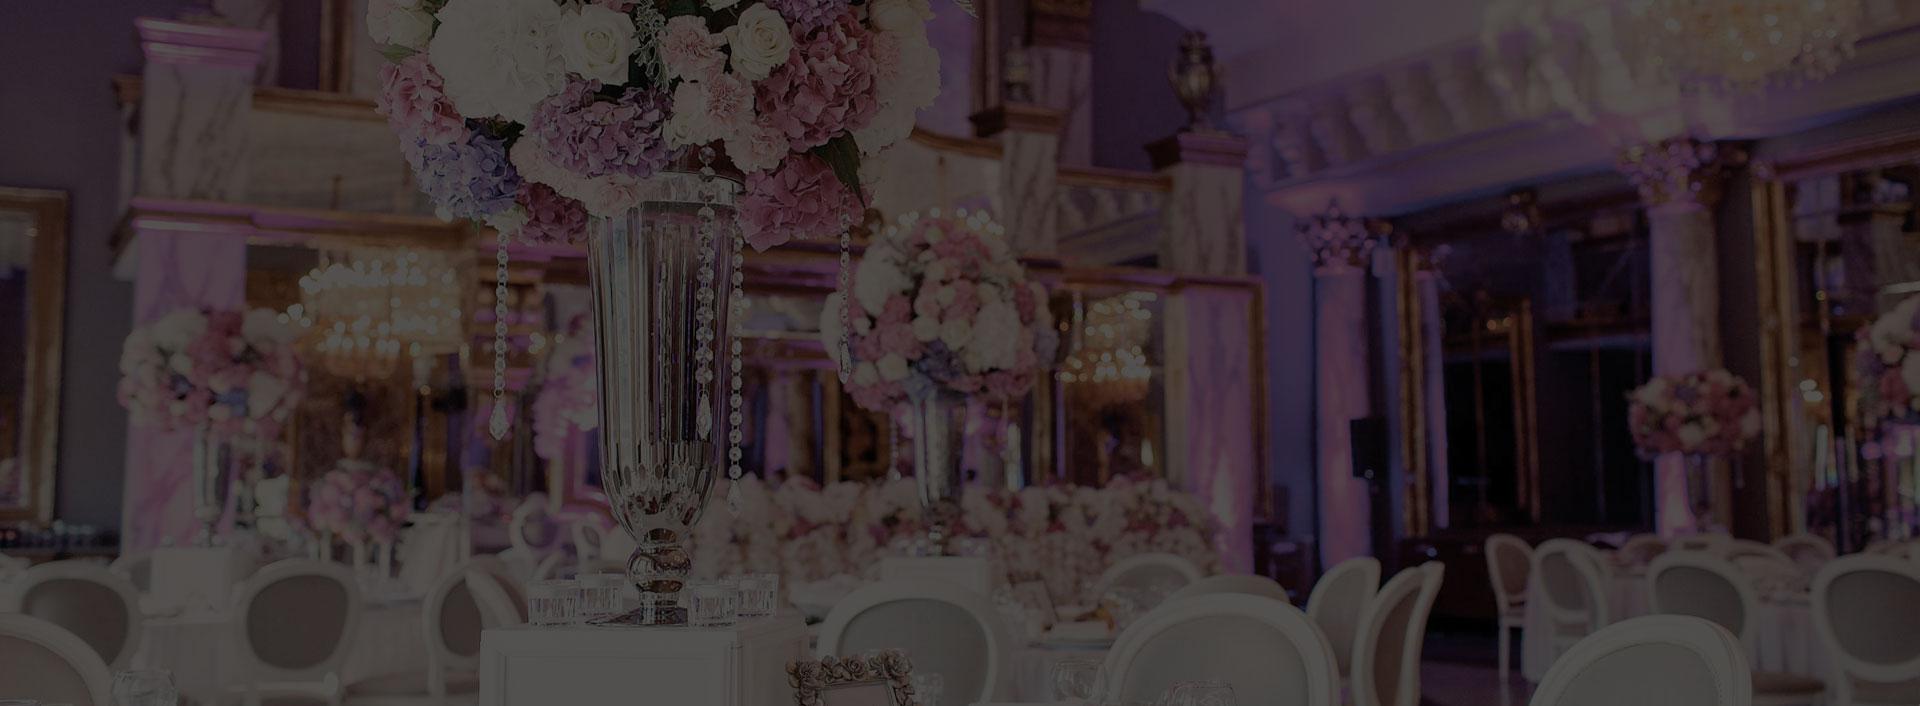 decoration mariage personnalise